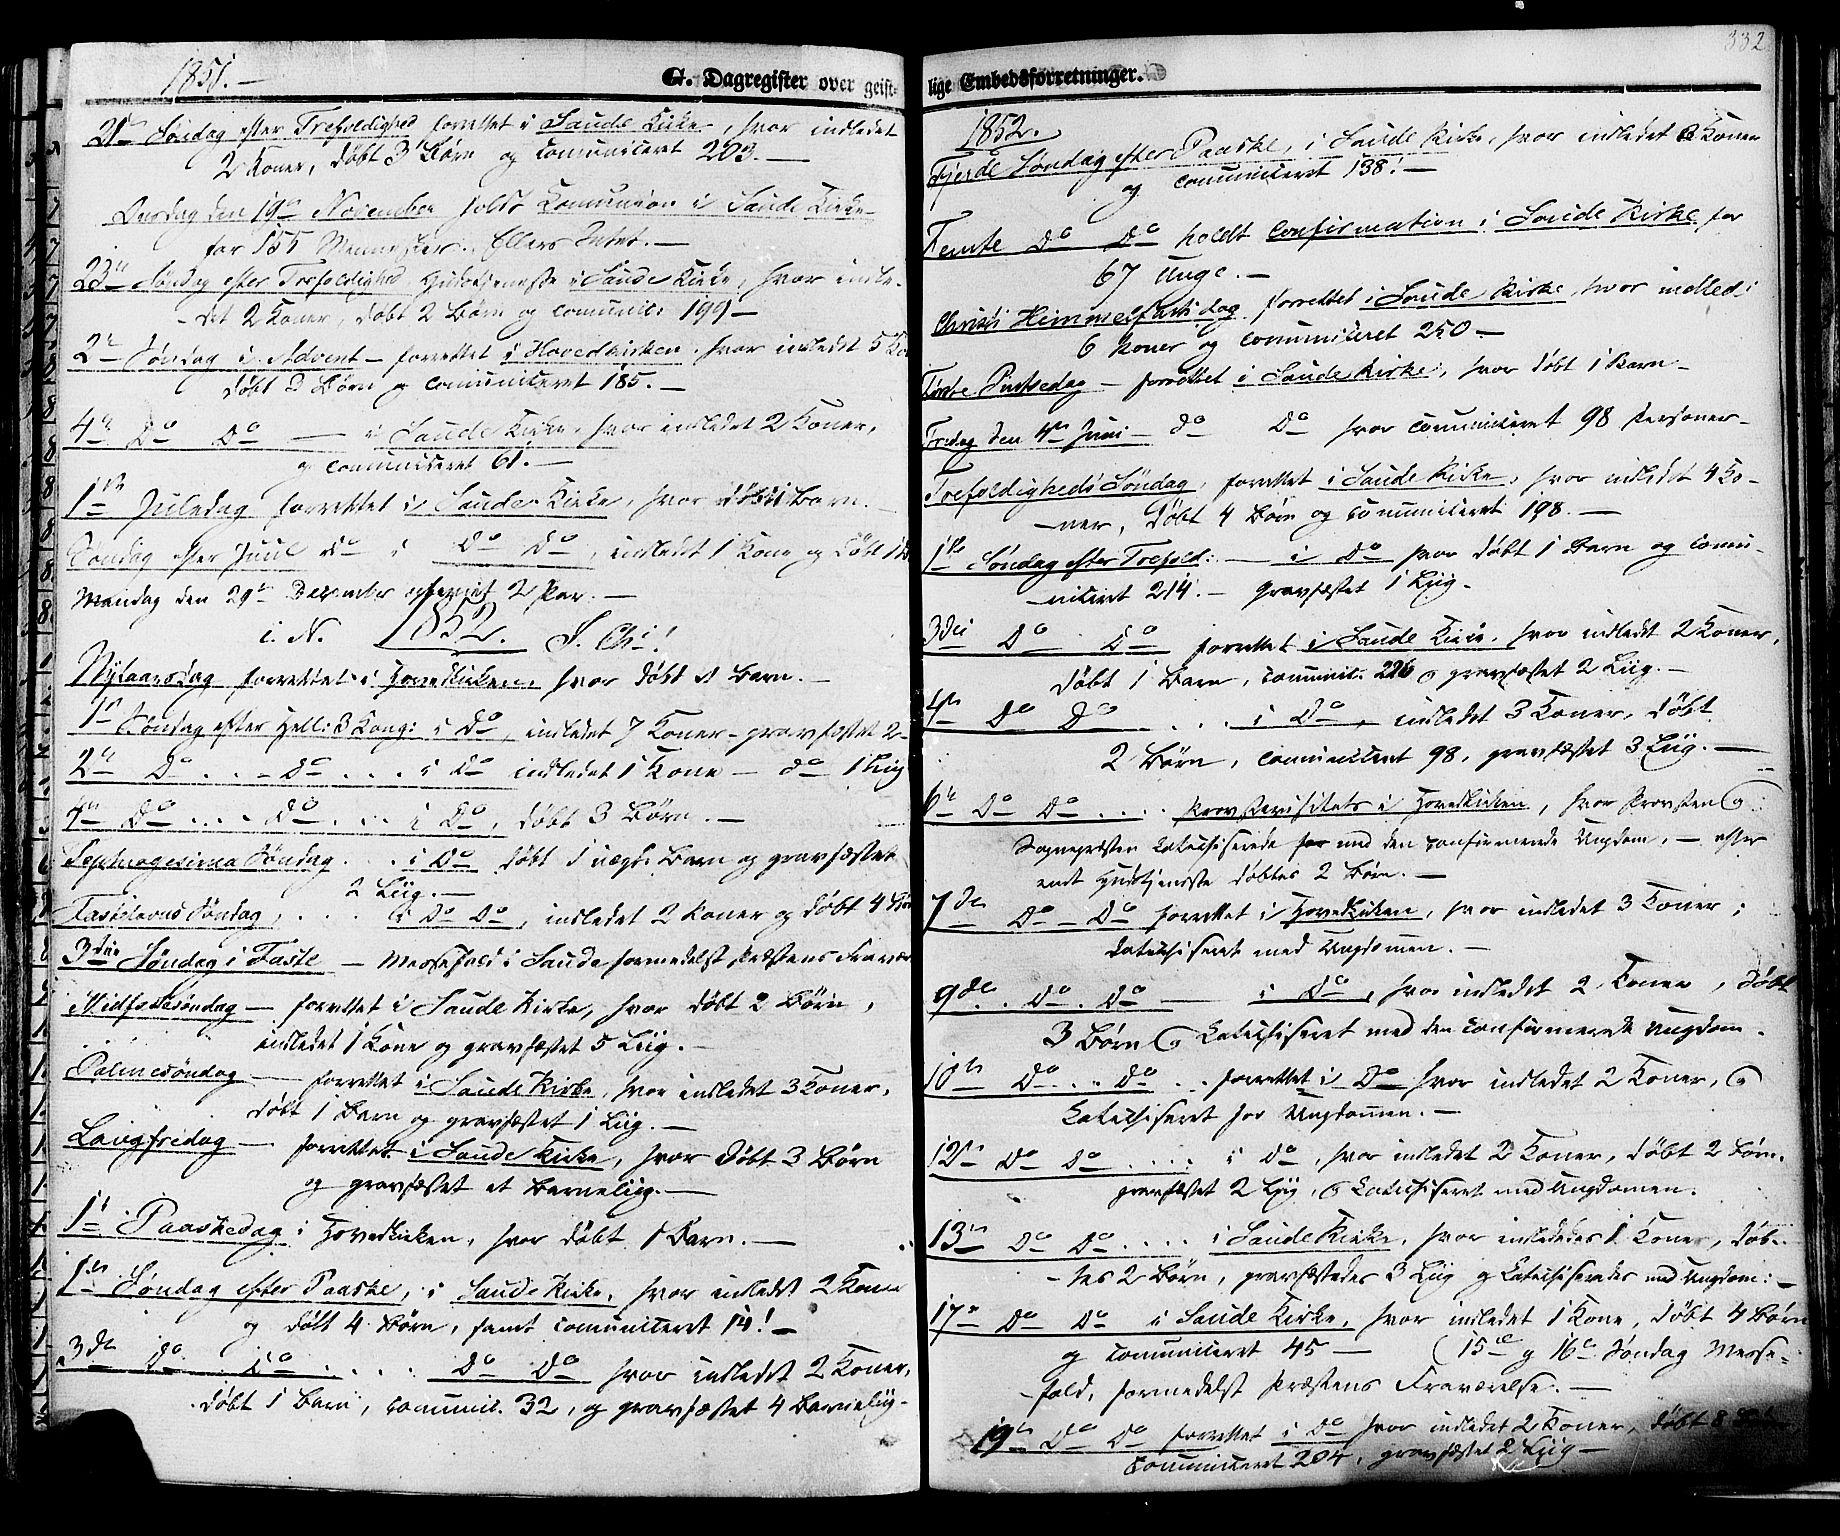 SAKO, Sauherad kirkebøker, F/Fa/L0007: Ministerialbok nr. I 7, 1851-1873, s. 332